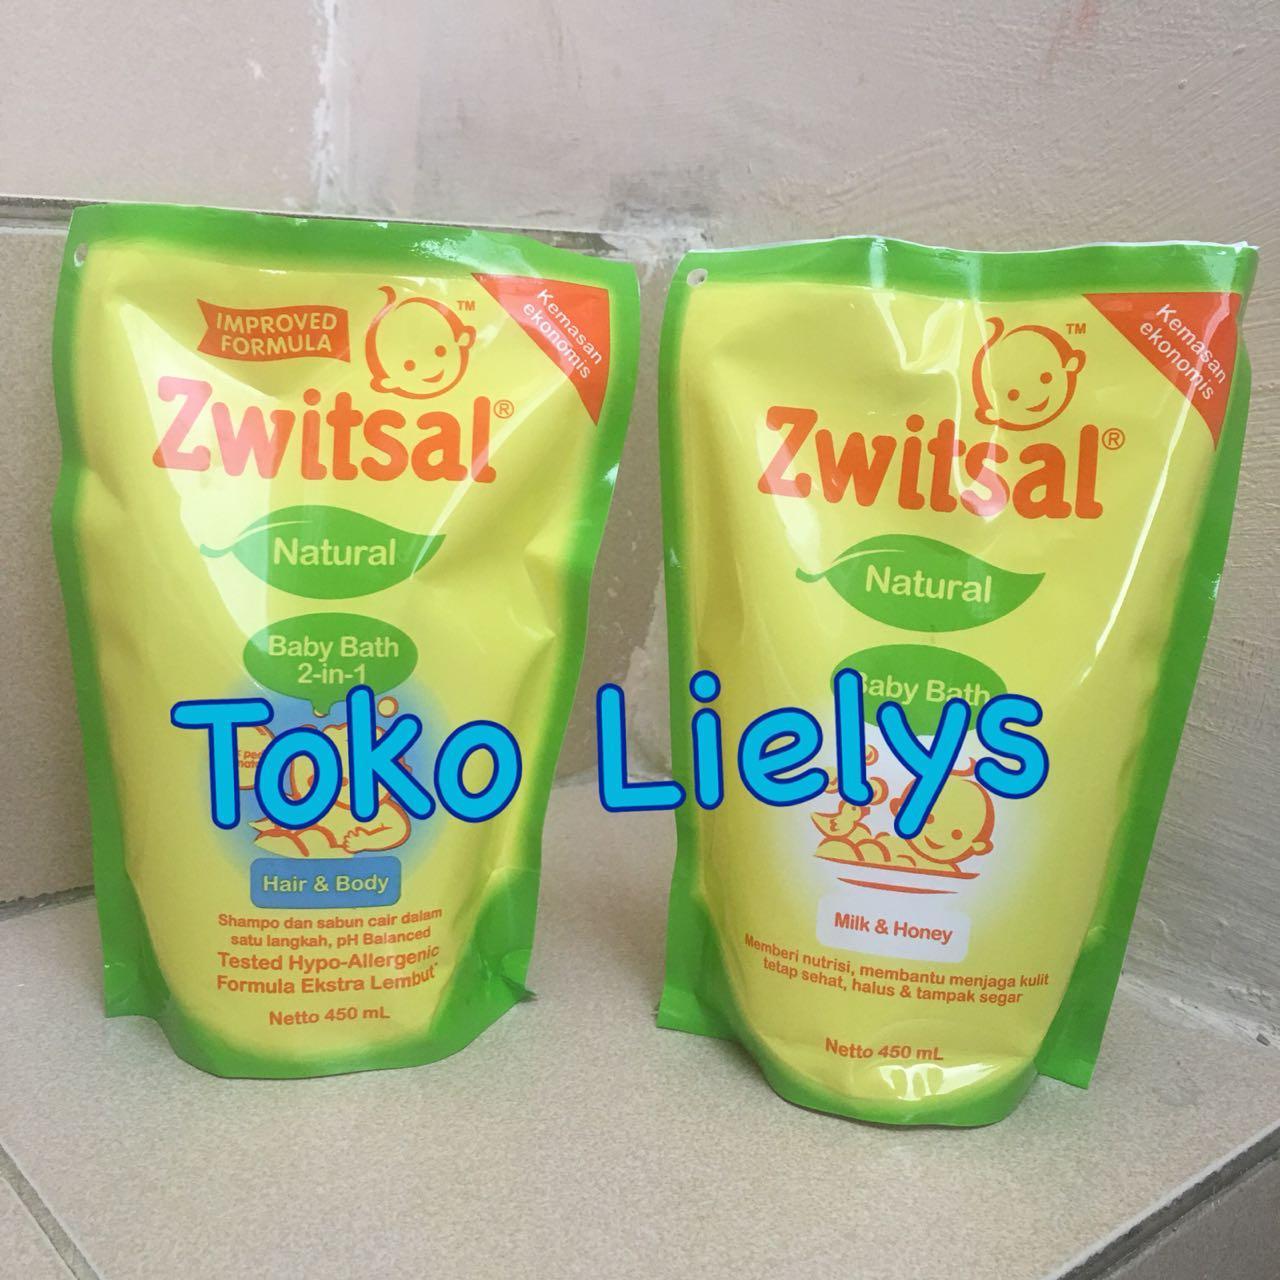 Zwitsal Natural Baby Bath 2in1 Hair & Body Minyak Telon Milk & Honey Pouch Refill 450ml